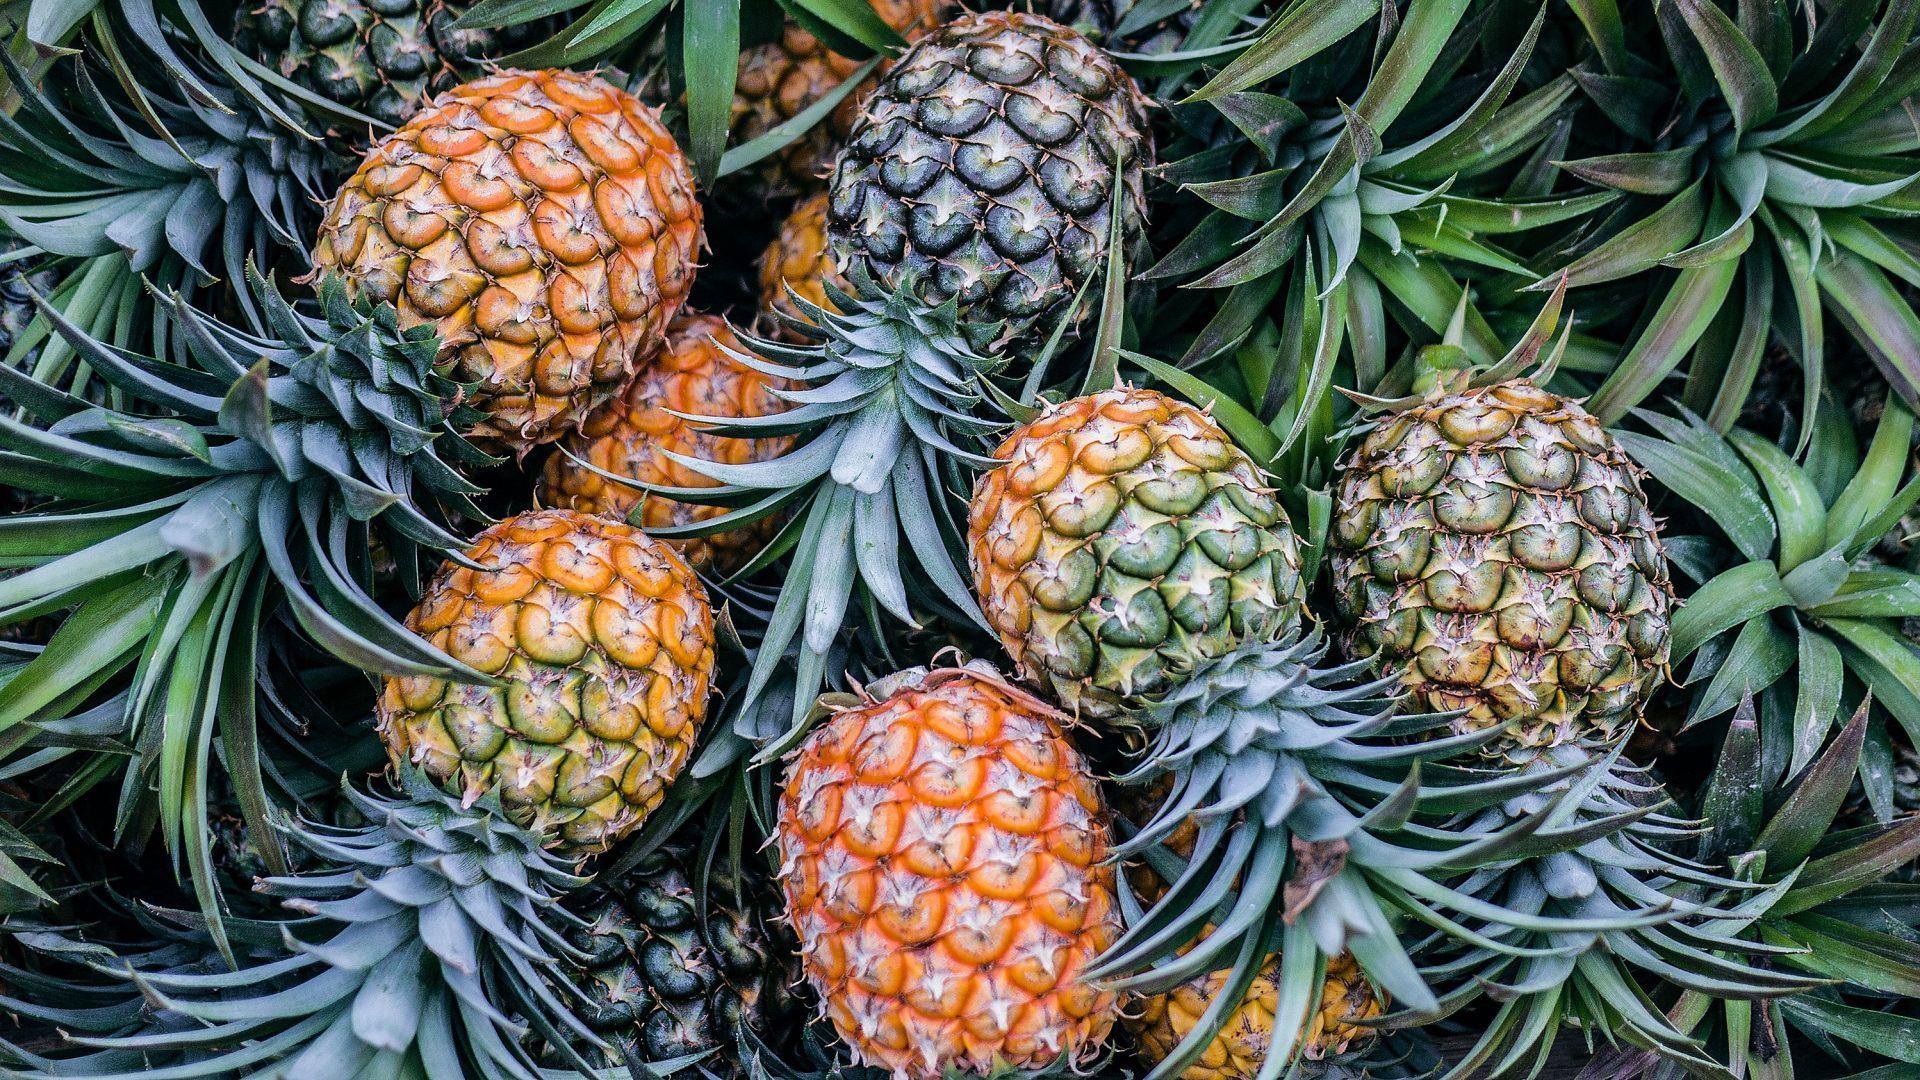 orange and green pineapple fruits